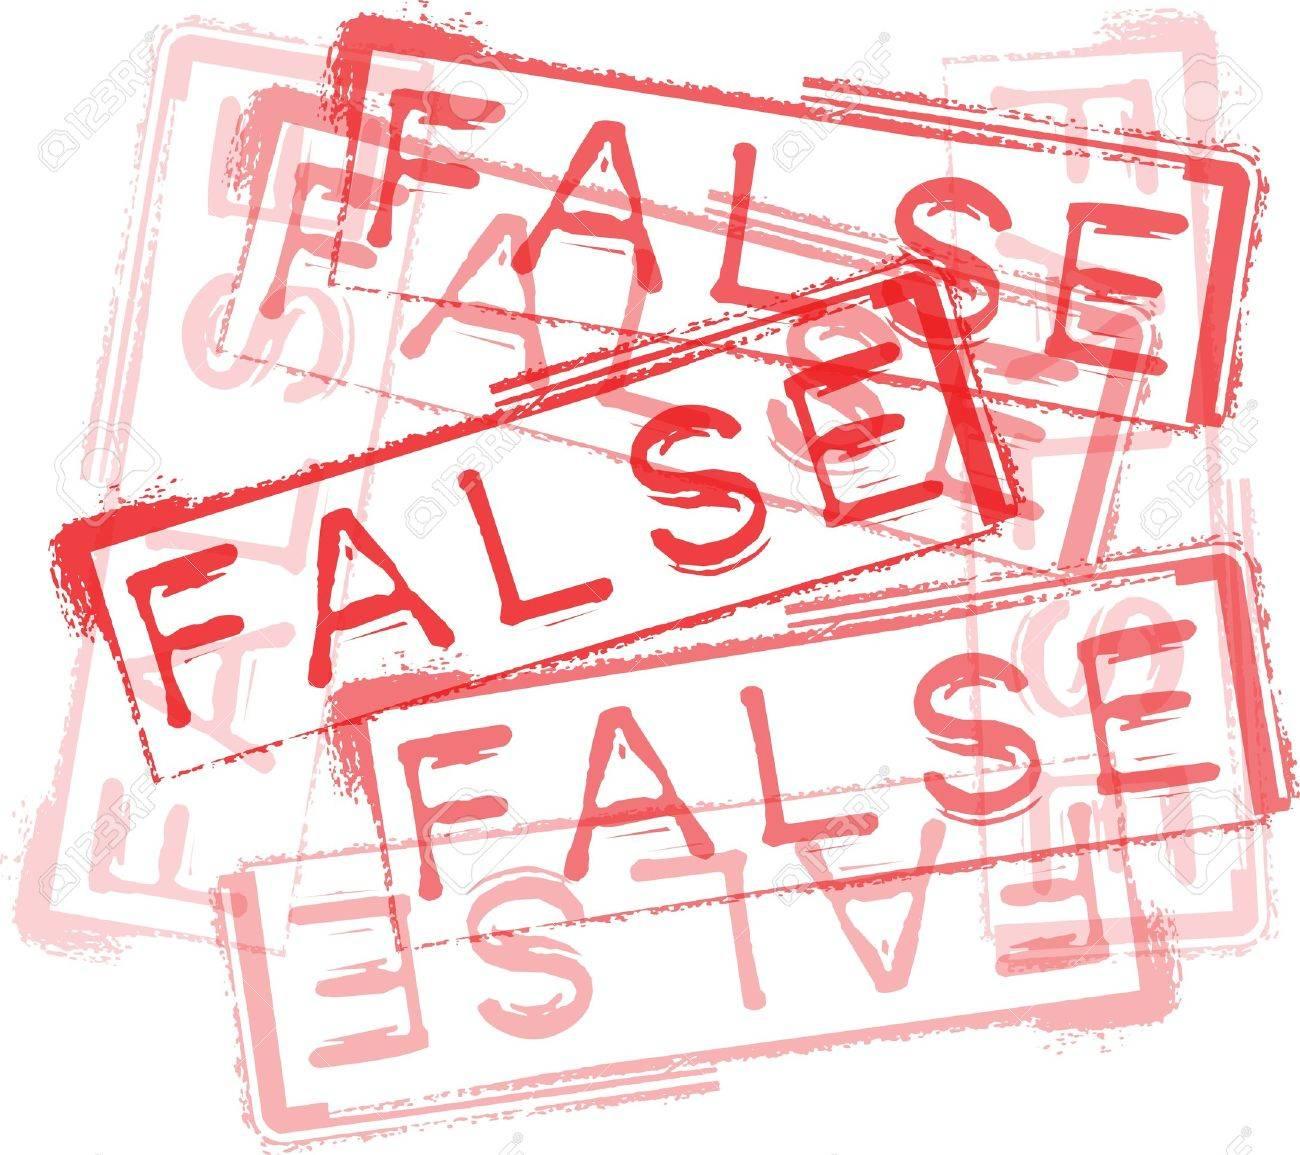 FALSE rubber stamp print. Vector illustration Stock Vector - 14657045